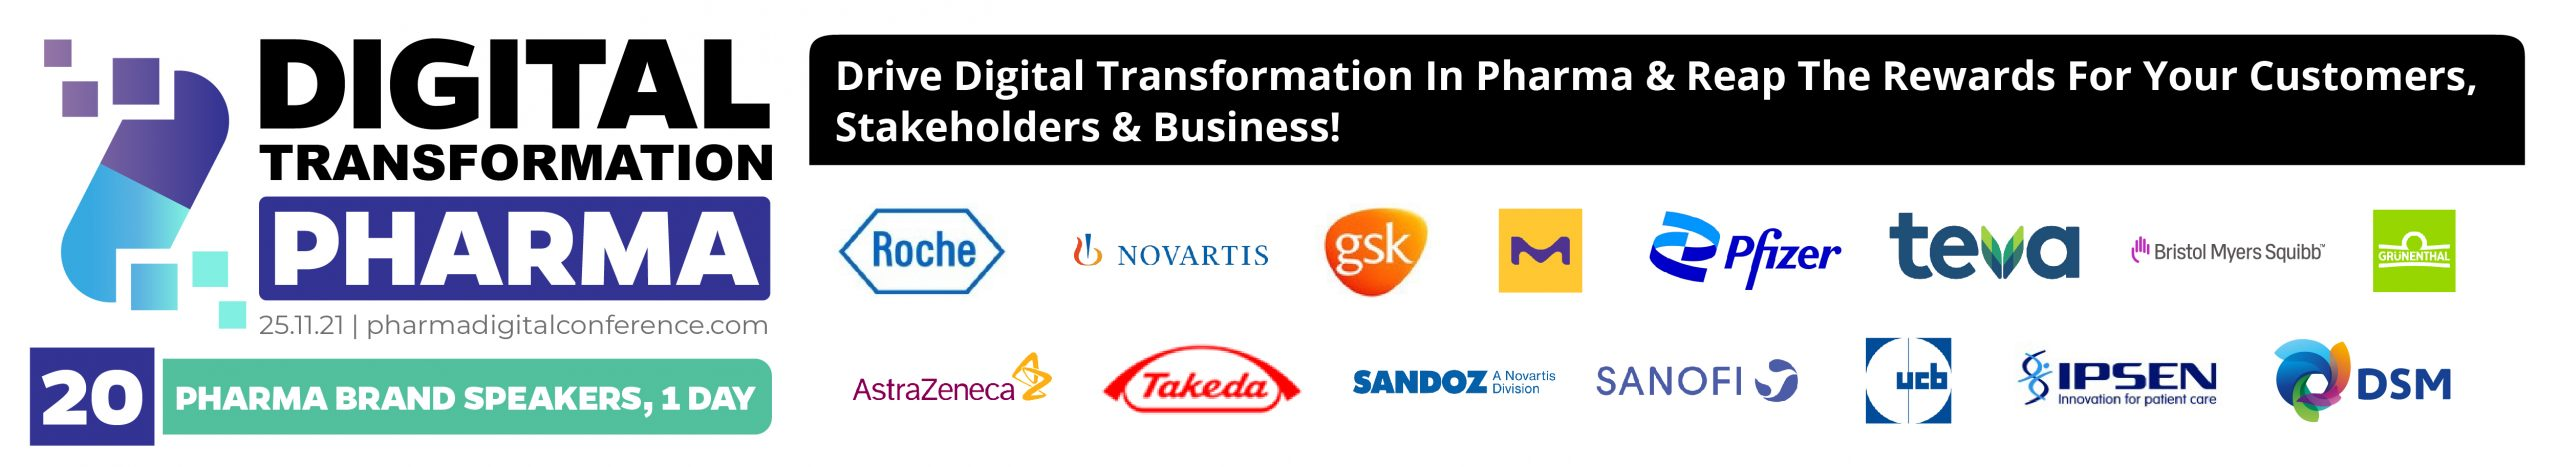 Pharma Digital Transformation Conference